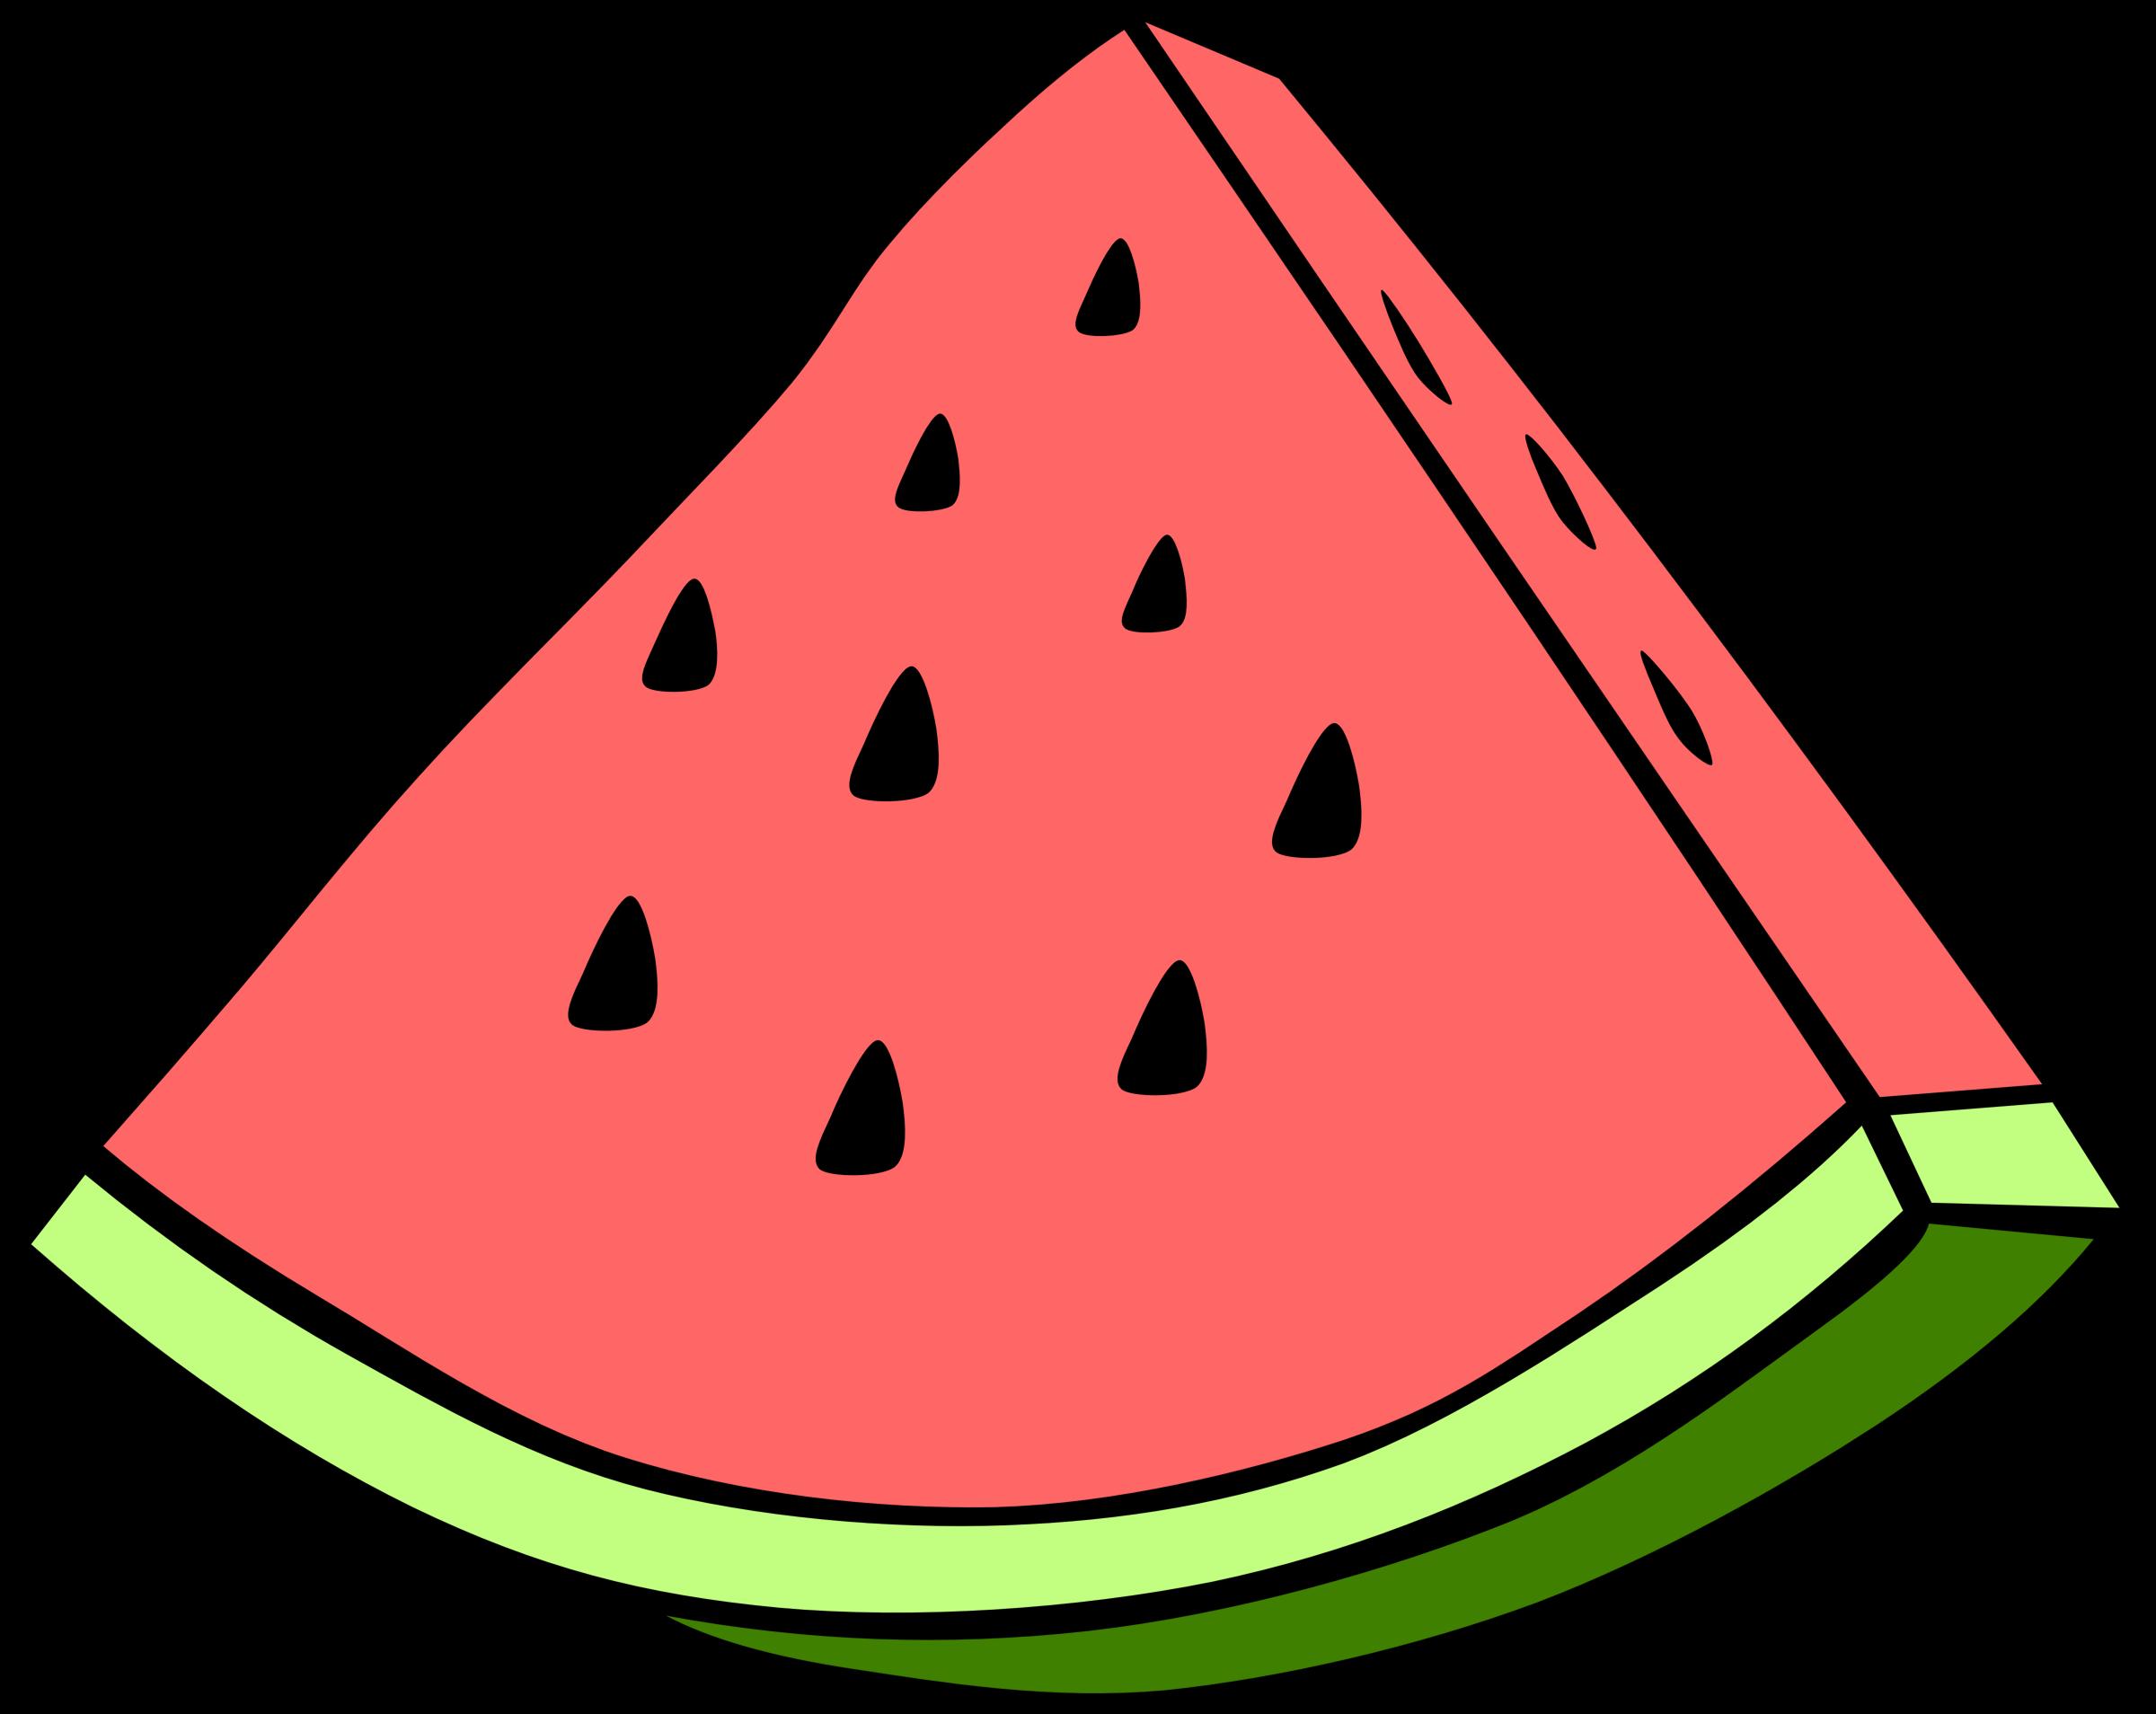 Clipart free fruit. Simple watermelon big image